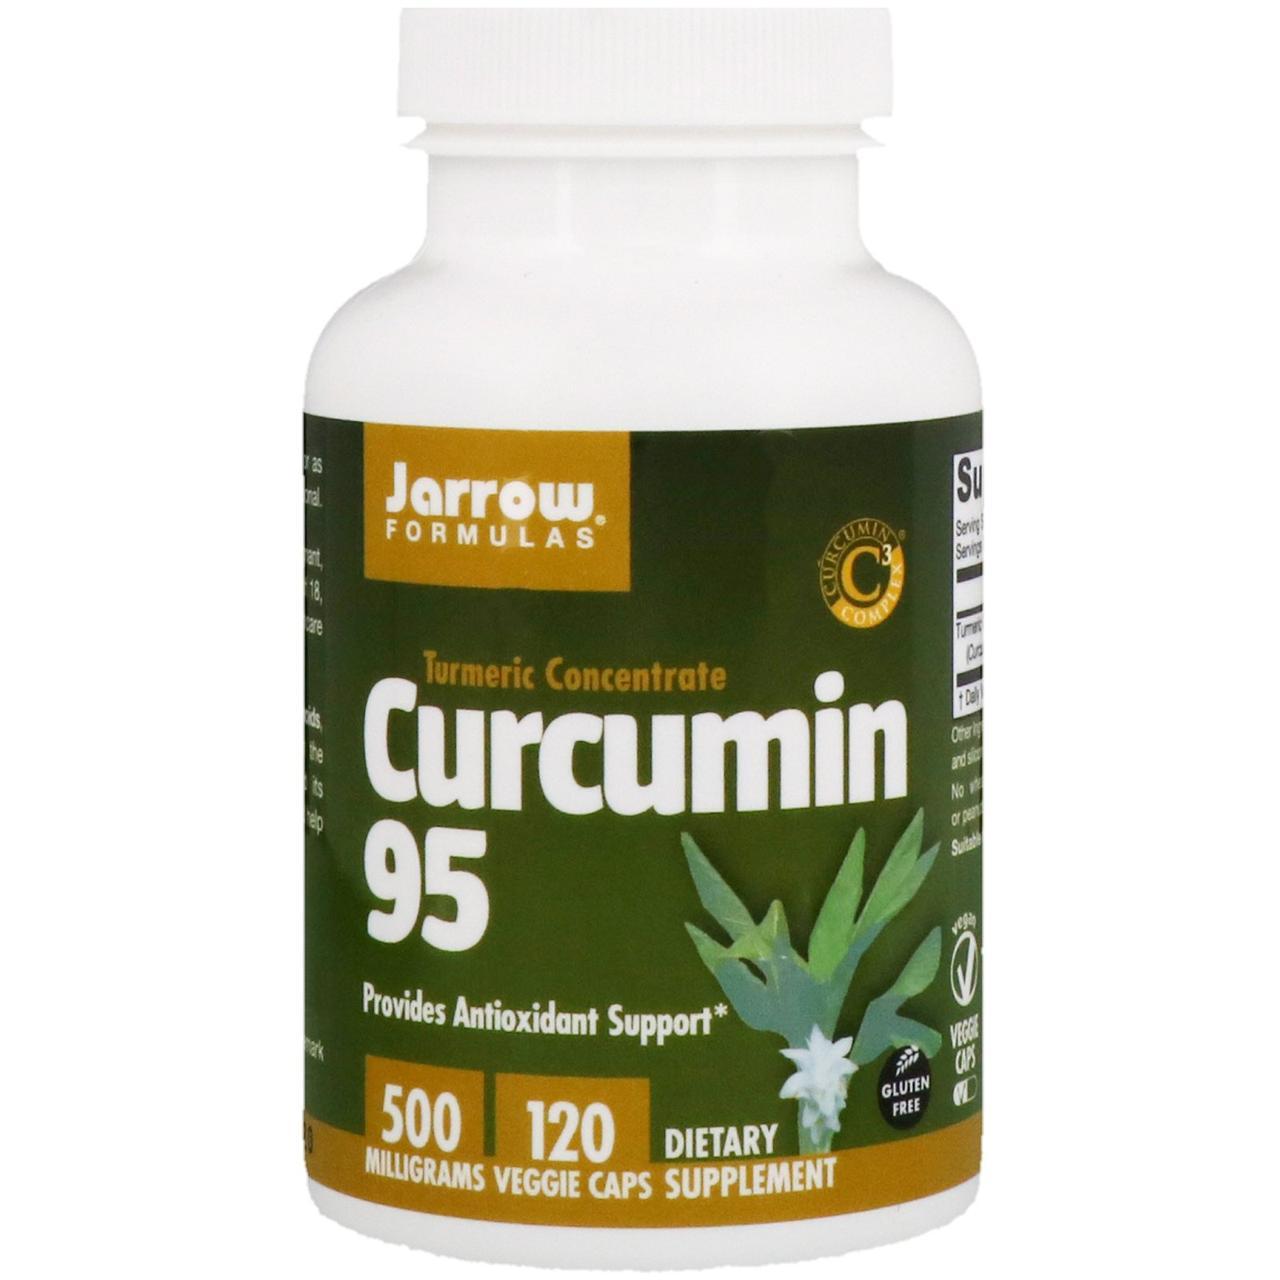 Куркумин 95, Jarrow Formulas, 500 мг, 120 капсул